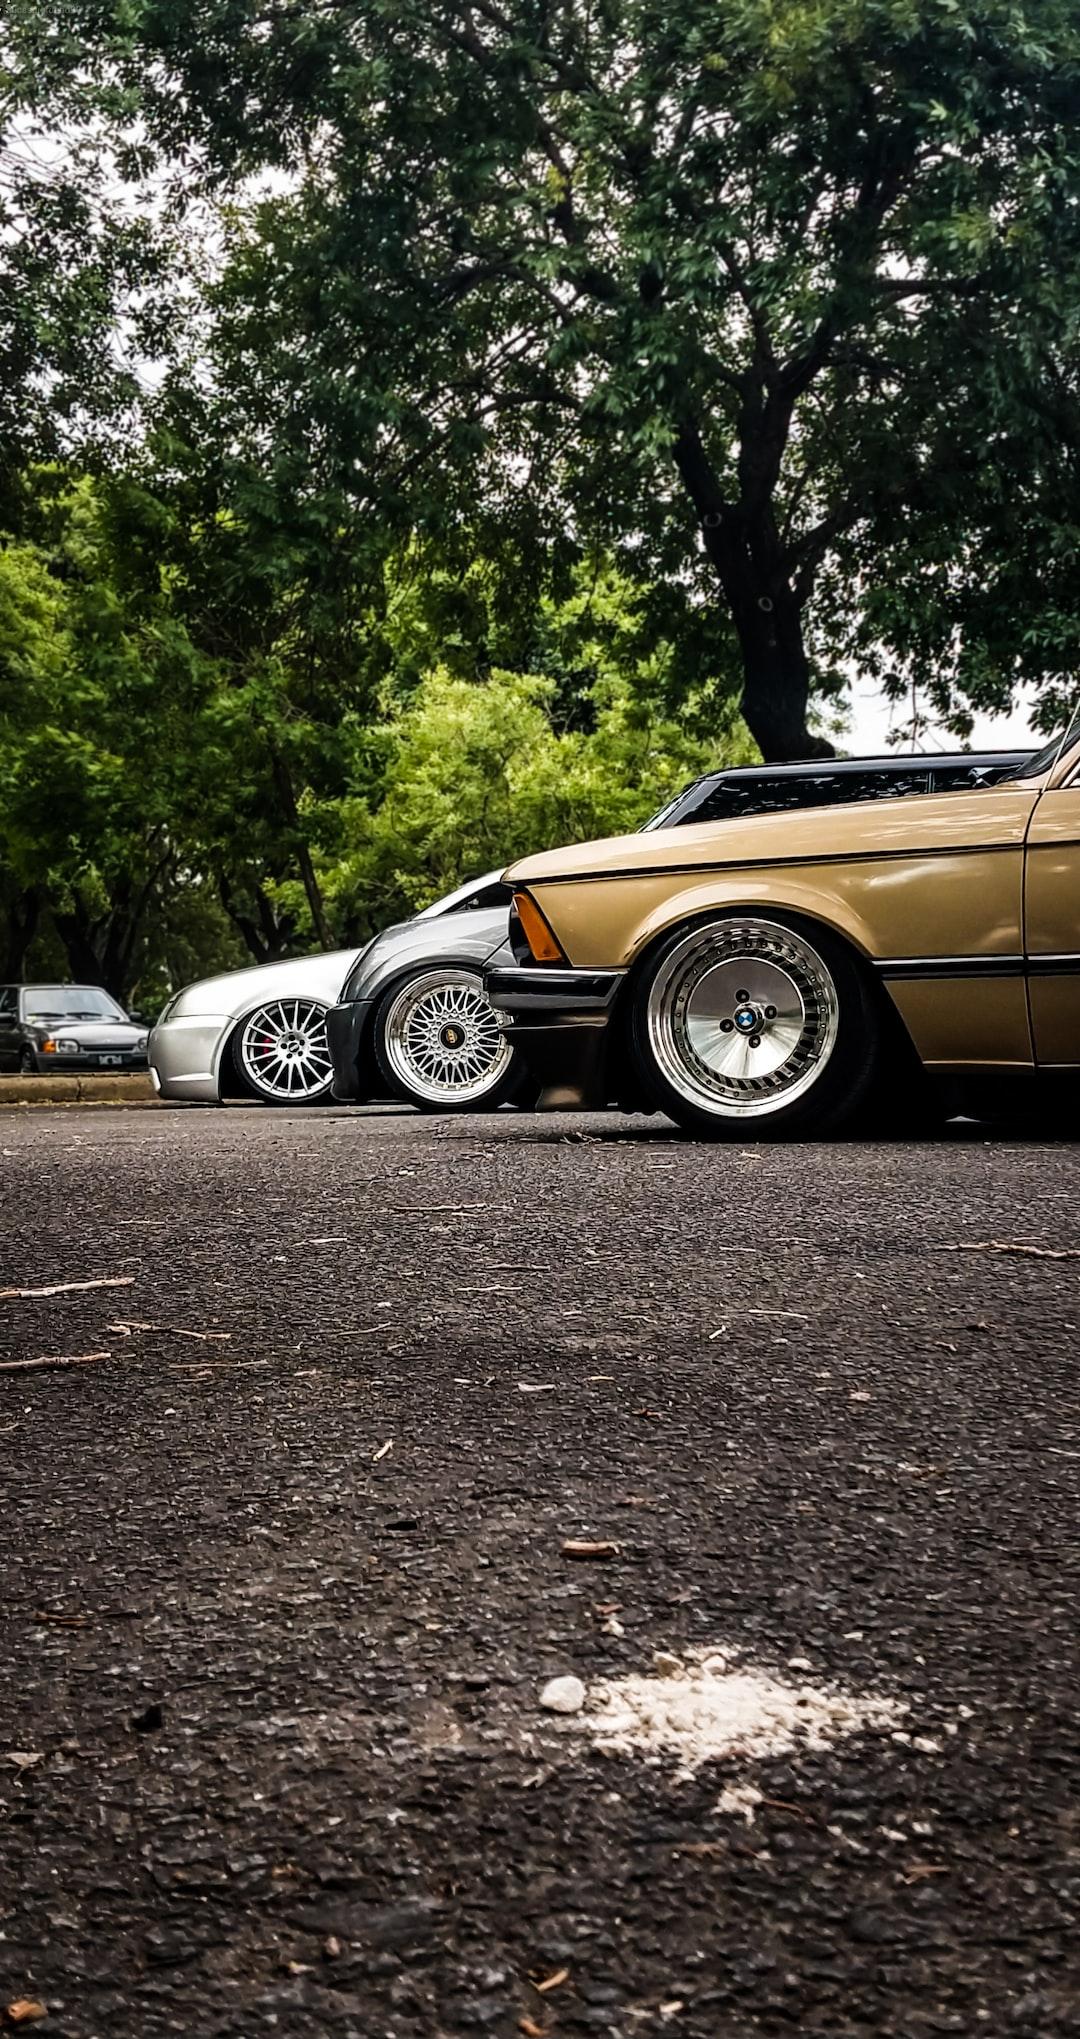 BMW 3-Series (E21), Mini Cooper S (R53) and Volkswagen Bora/Jetta (Mk1/Mk4) at Turrificado's car meeting in Parque Sarmiento (Taken on January 12, in Parque Sarmiento, Ciudad de Buenos Aires, Argentina).